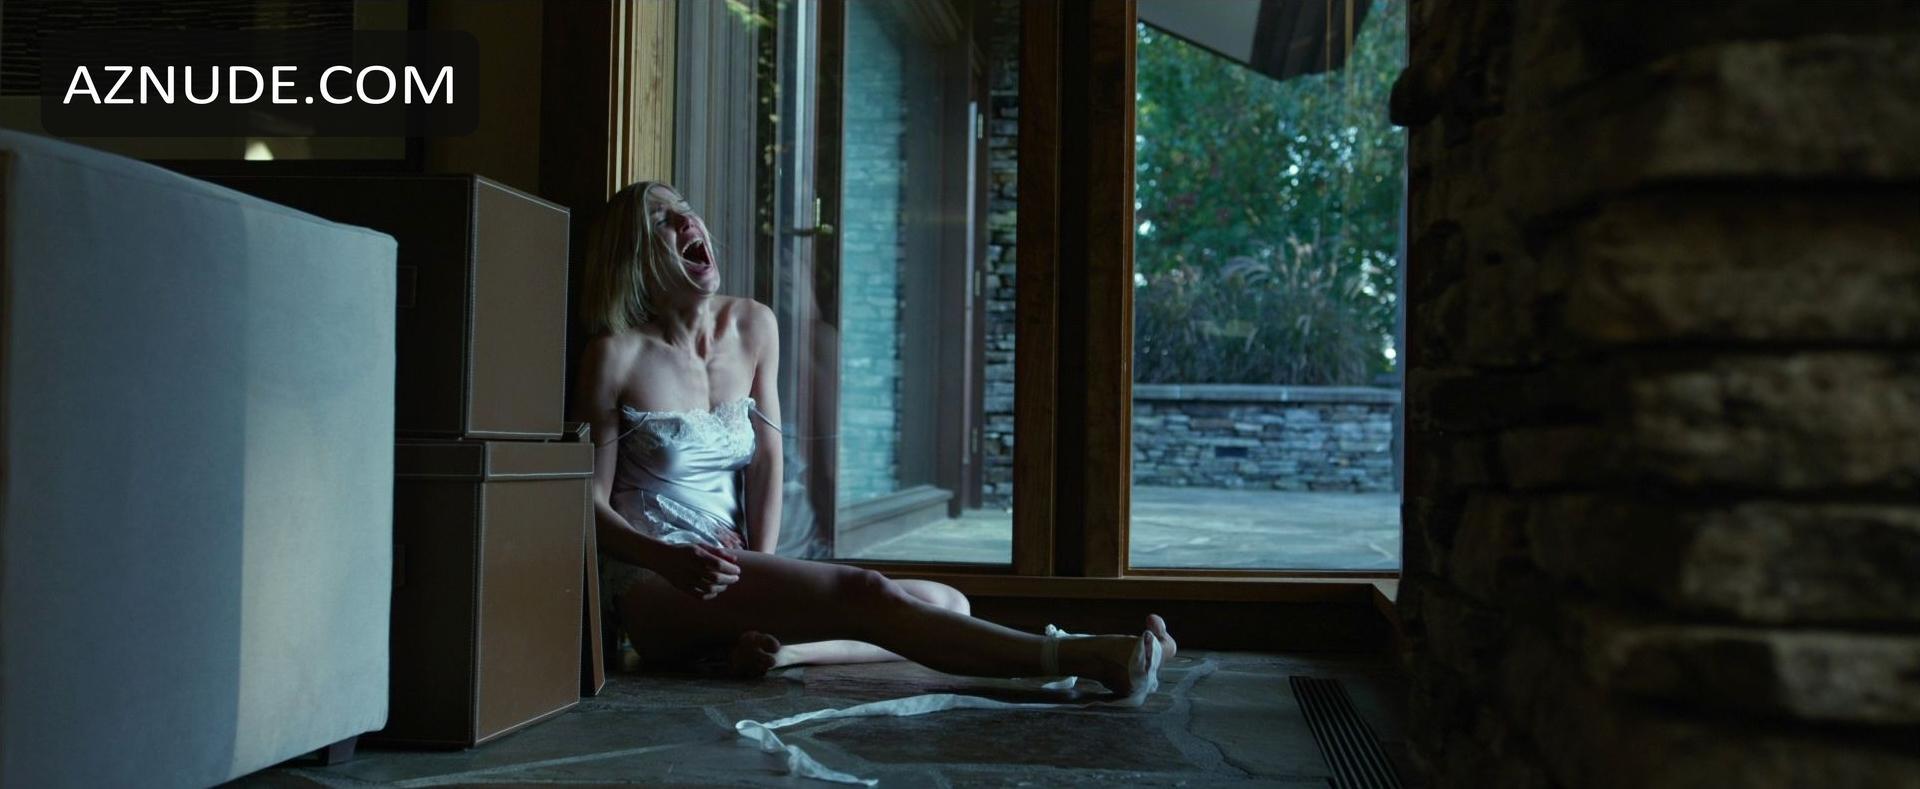 Rosamund pike gone girl nude-7905